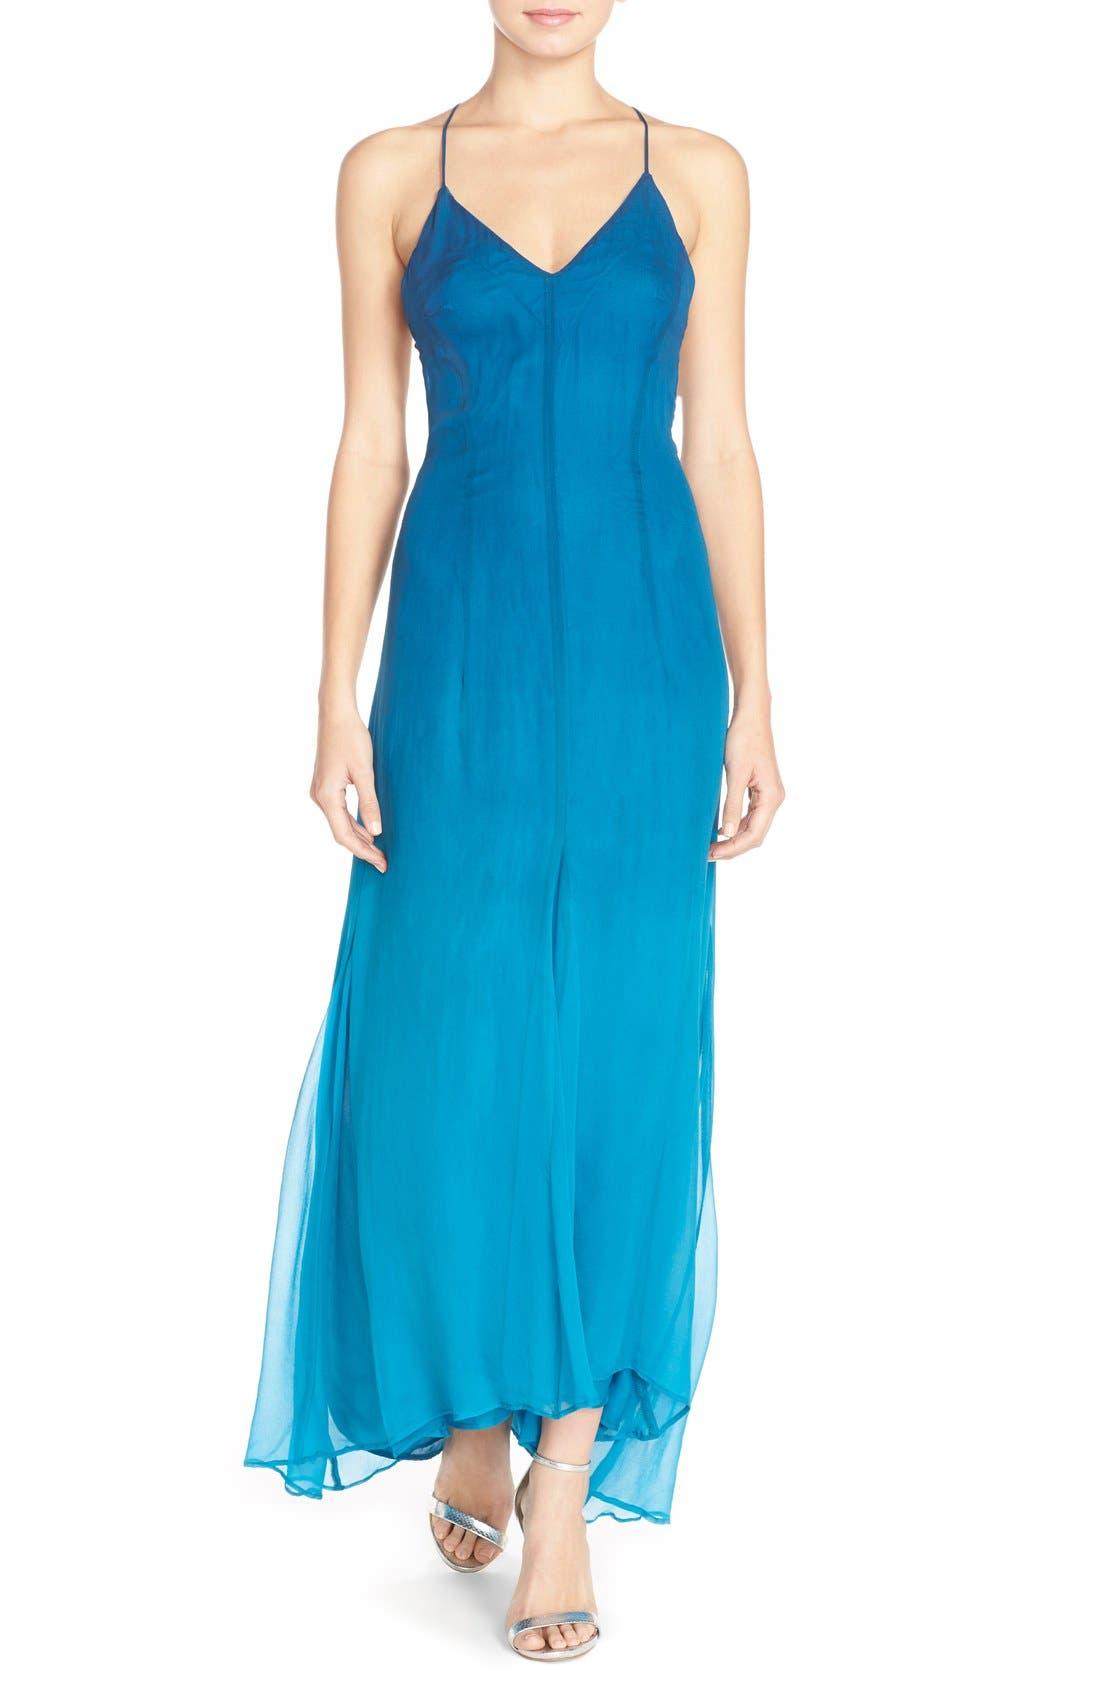 Alternate Image 1 Selected - Charlie Jade Ombré Maxi Dress with High/Low Hem